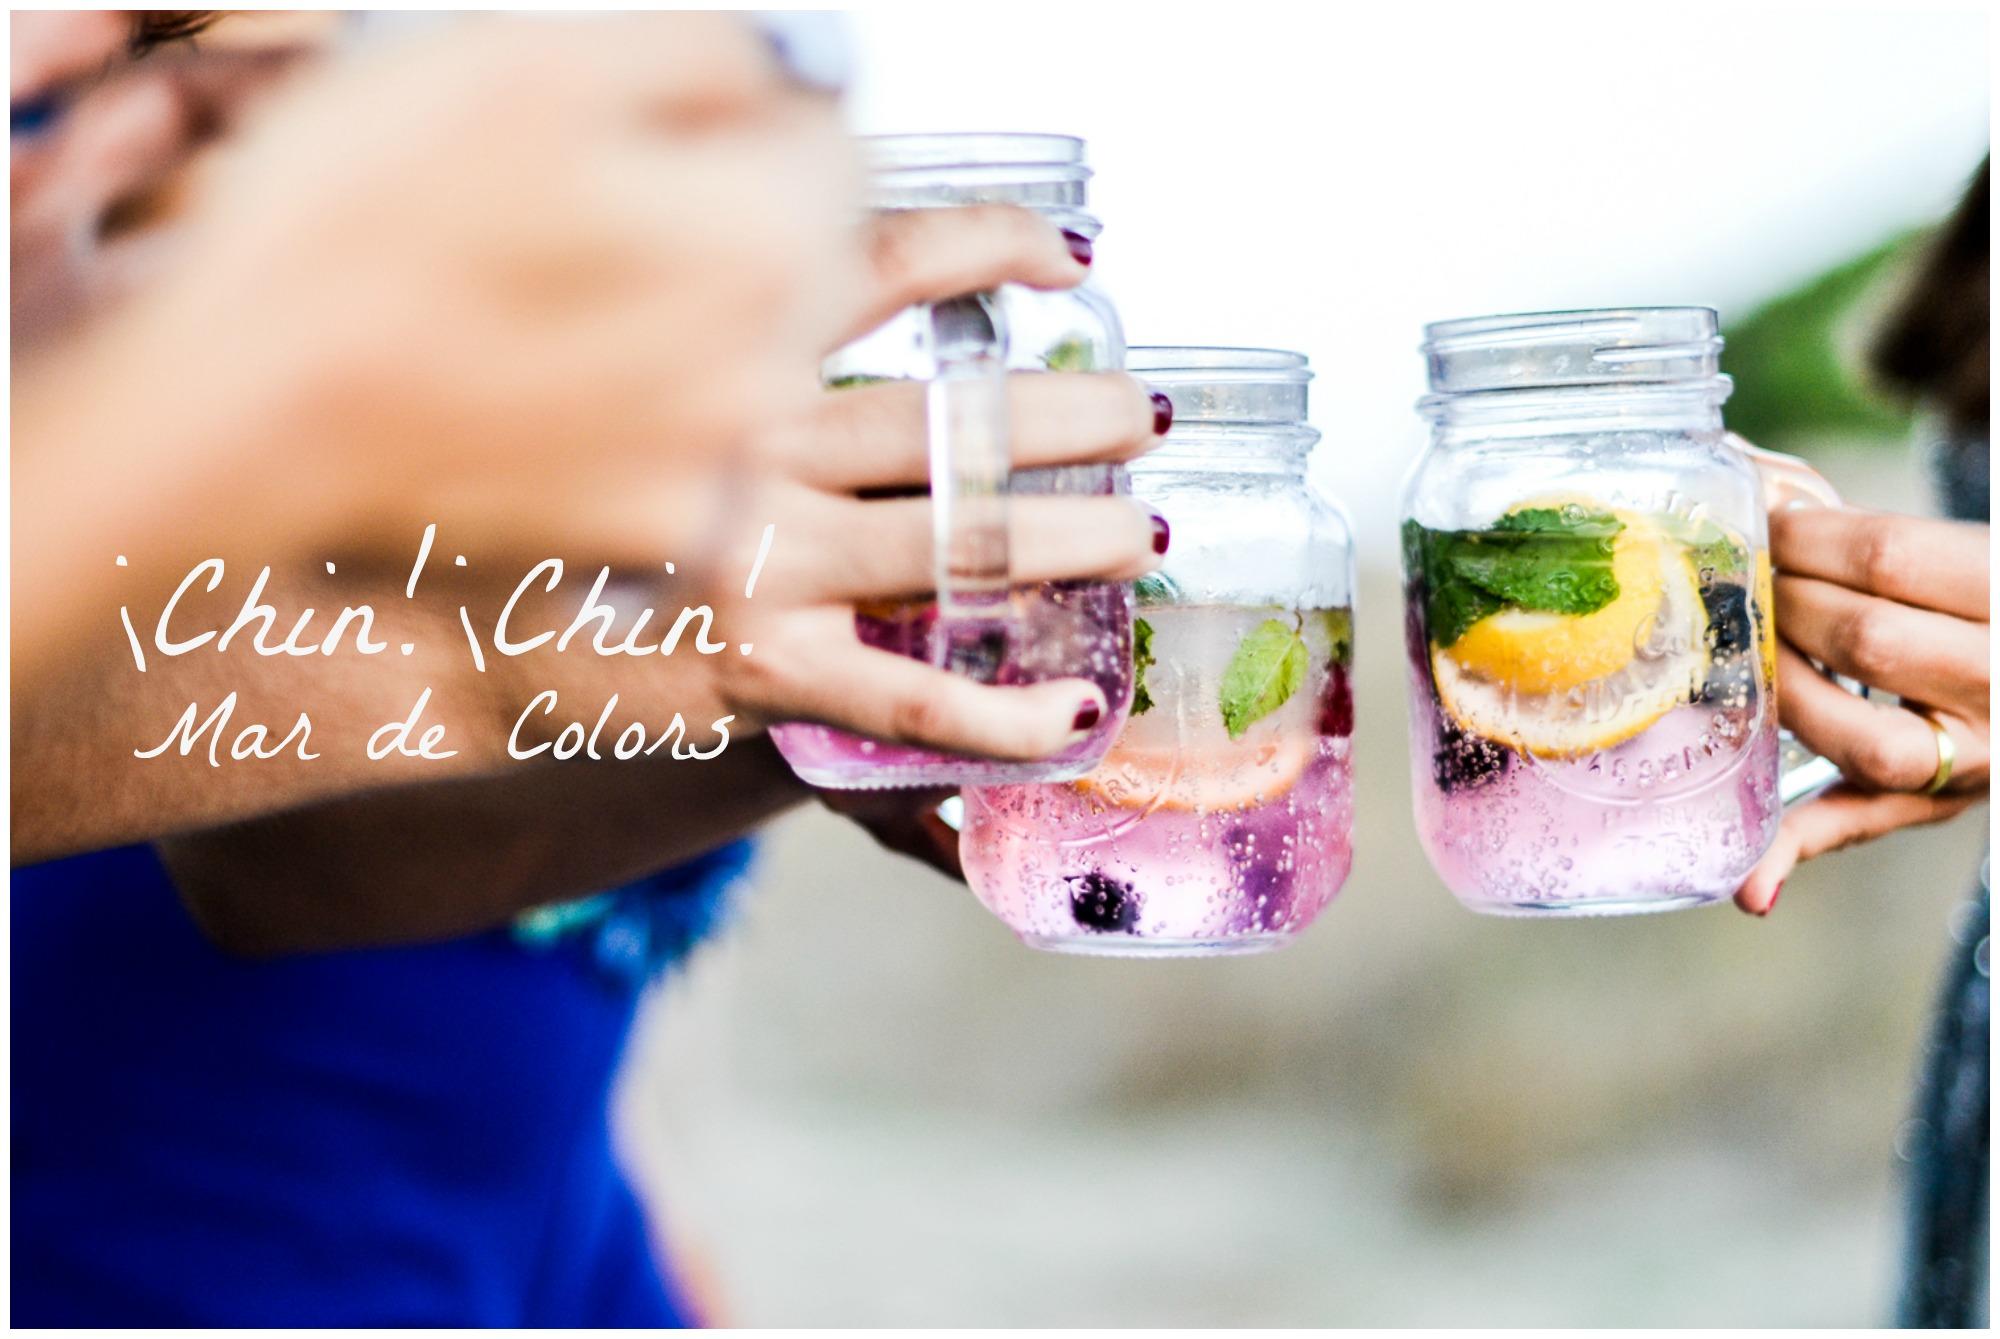 Chin chin Mar de Colors